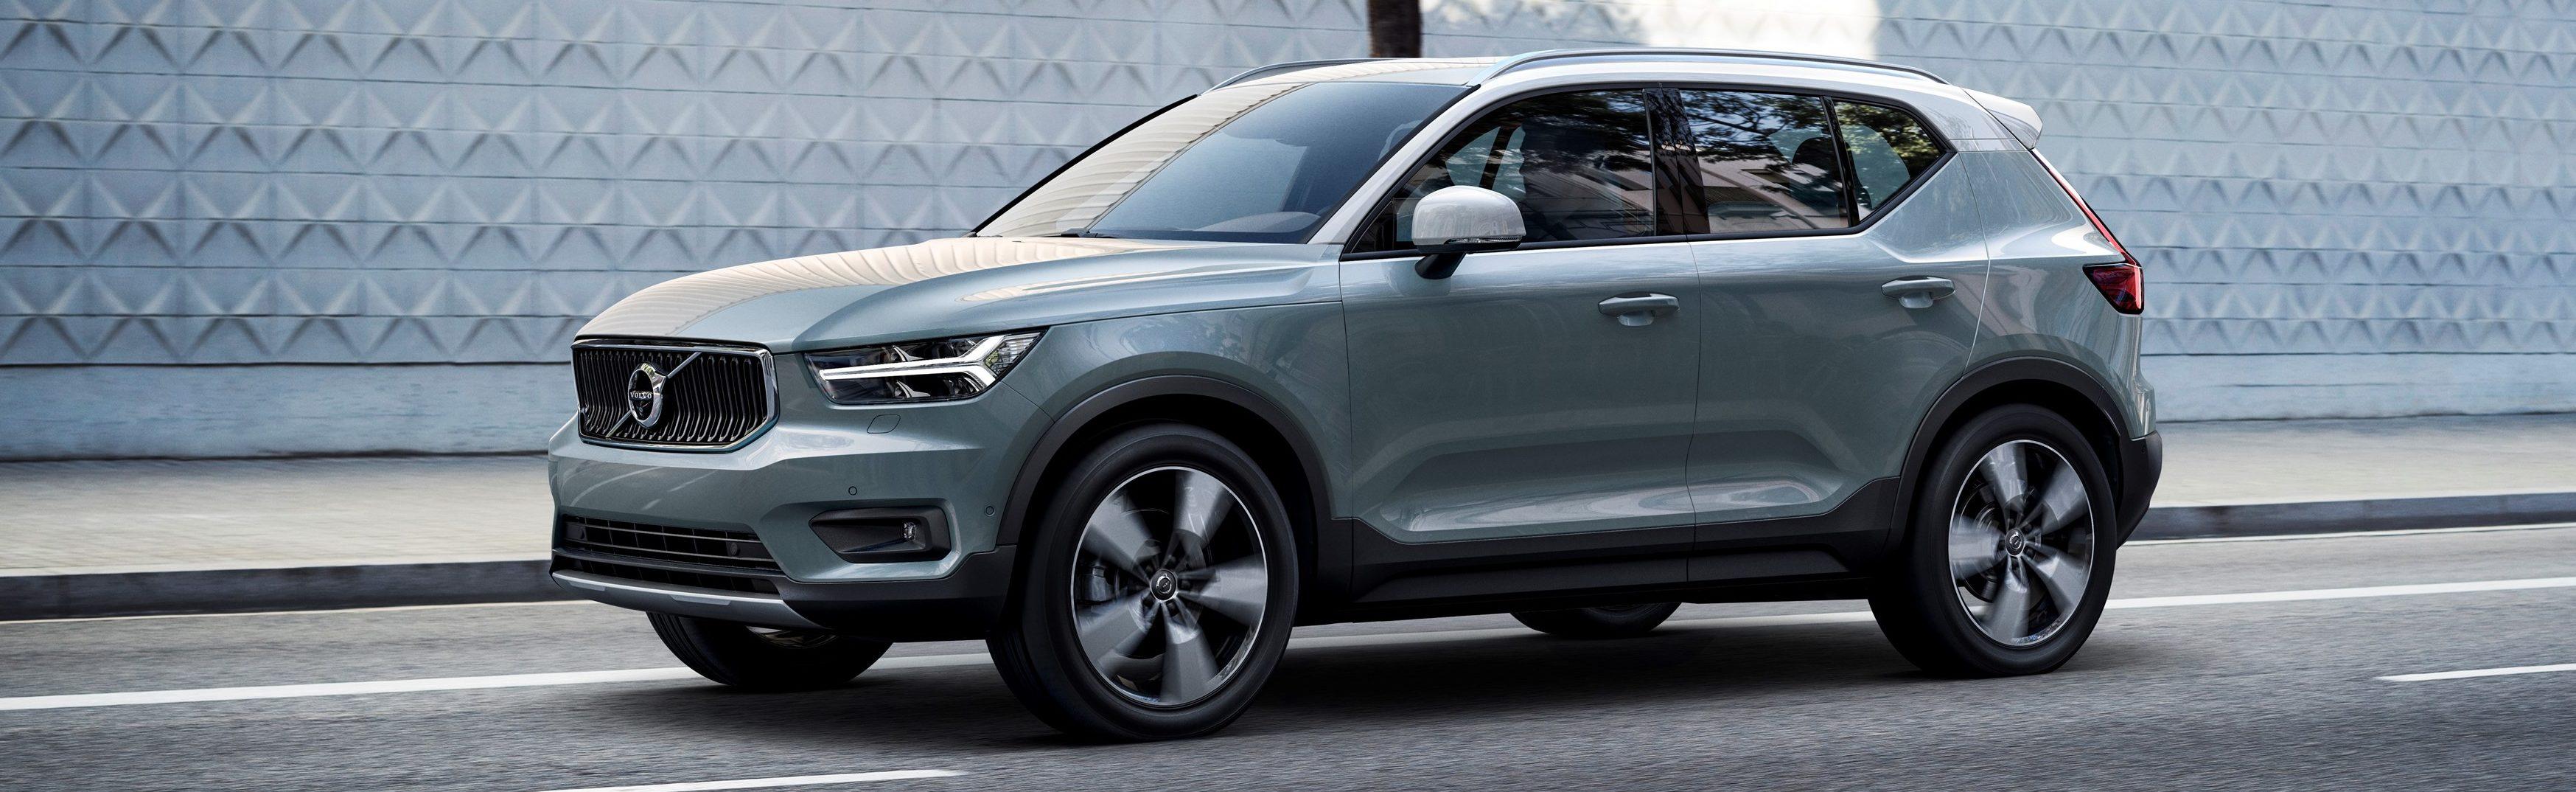 Volvo Xc40 2017 Preise Motoren Amp Verkaufsstart Carwow